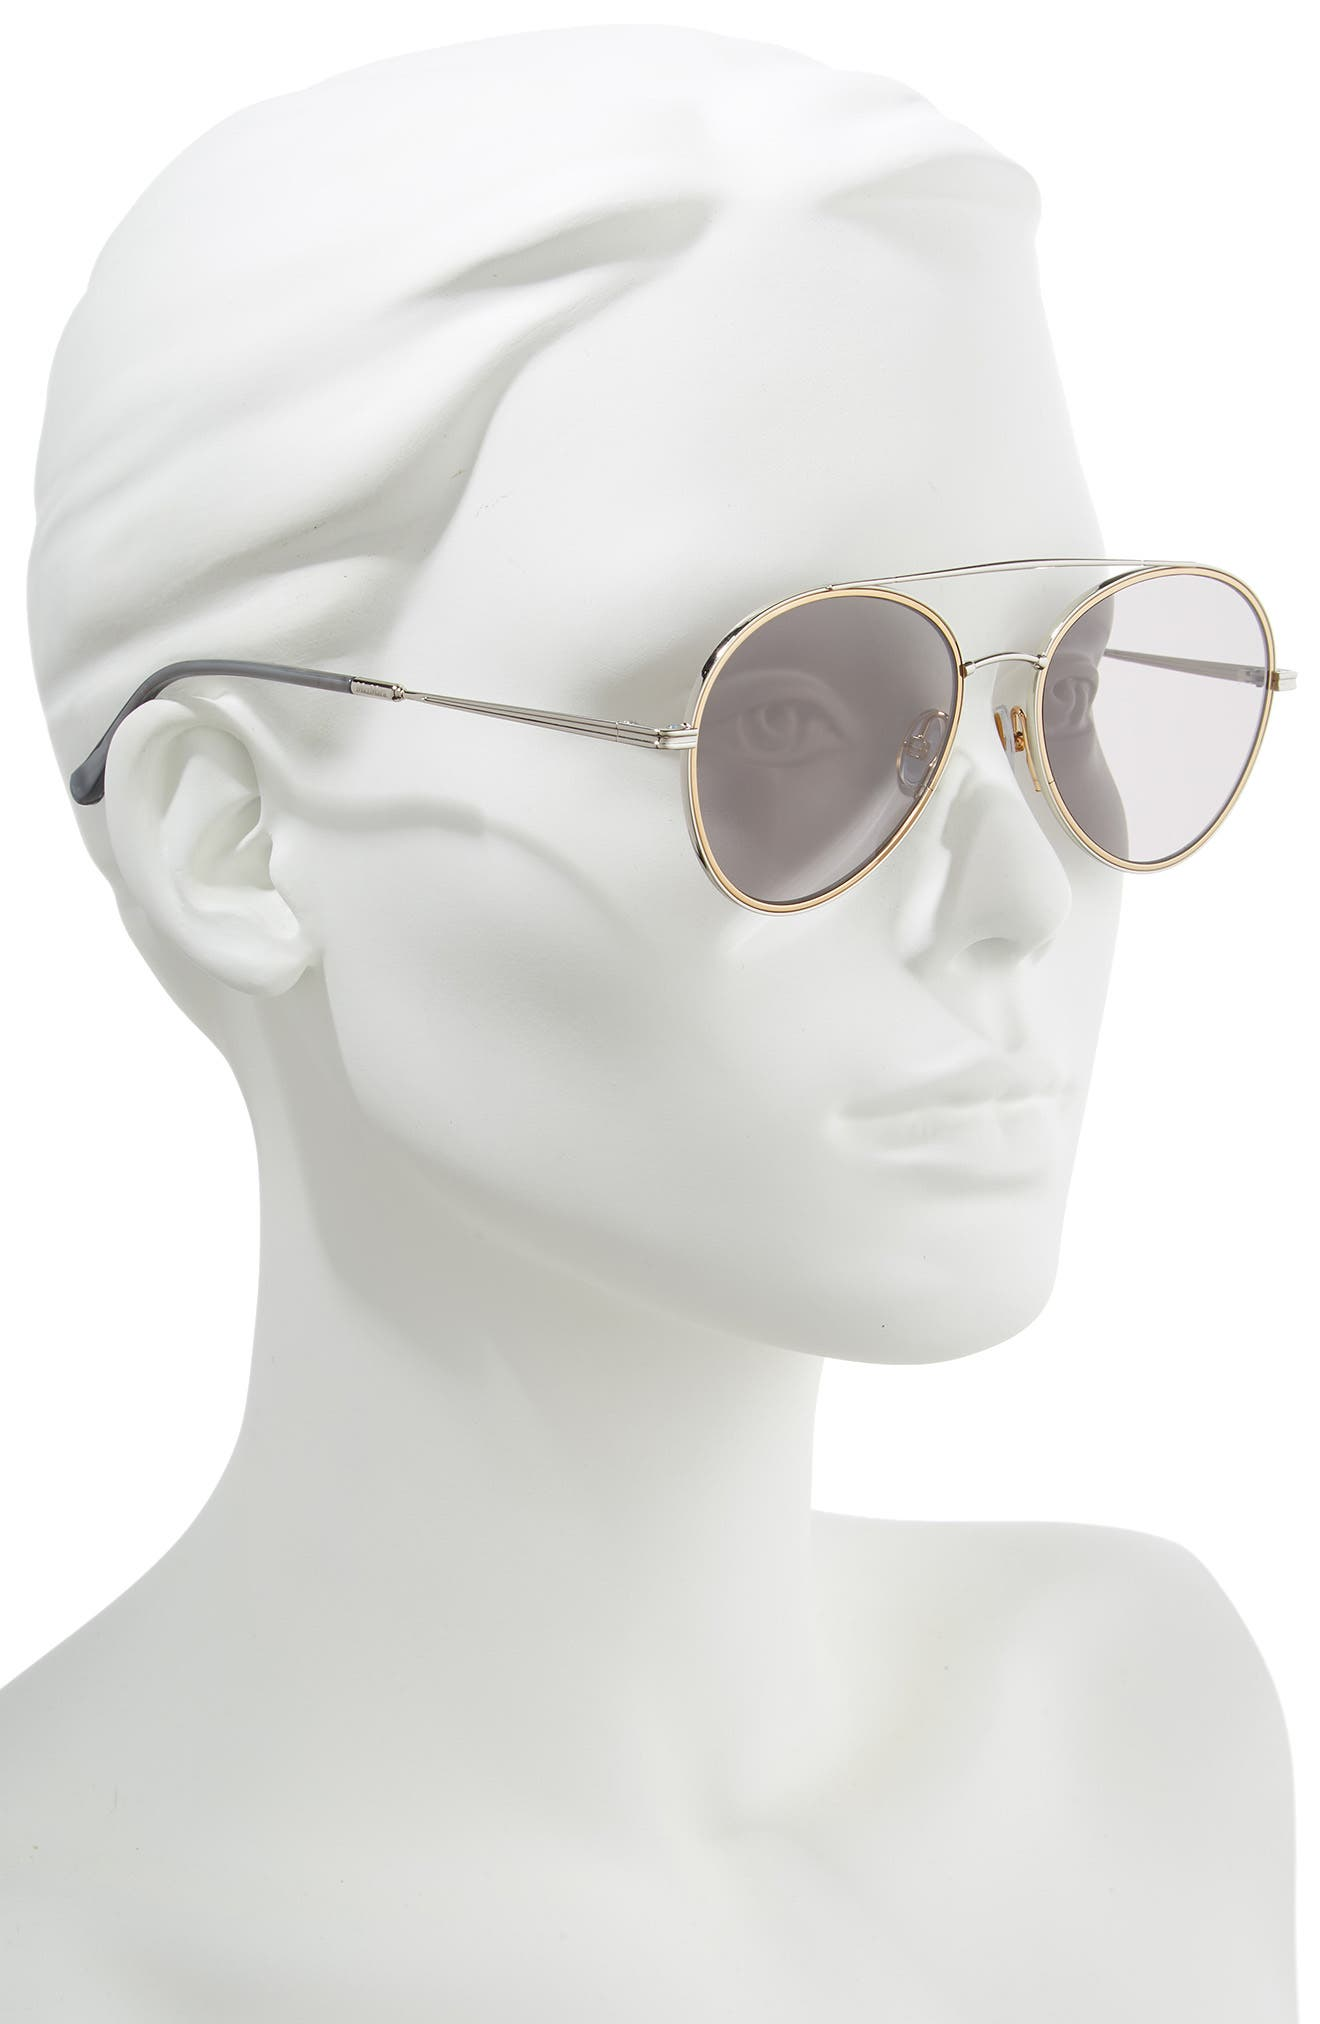 Wire II 54mm Aviator Sunglasses,                             Alternate thumbnail 2, color,                             SILVER